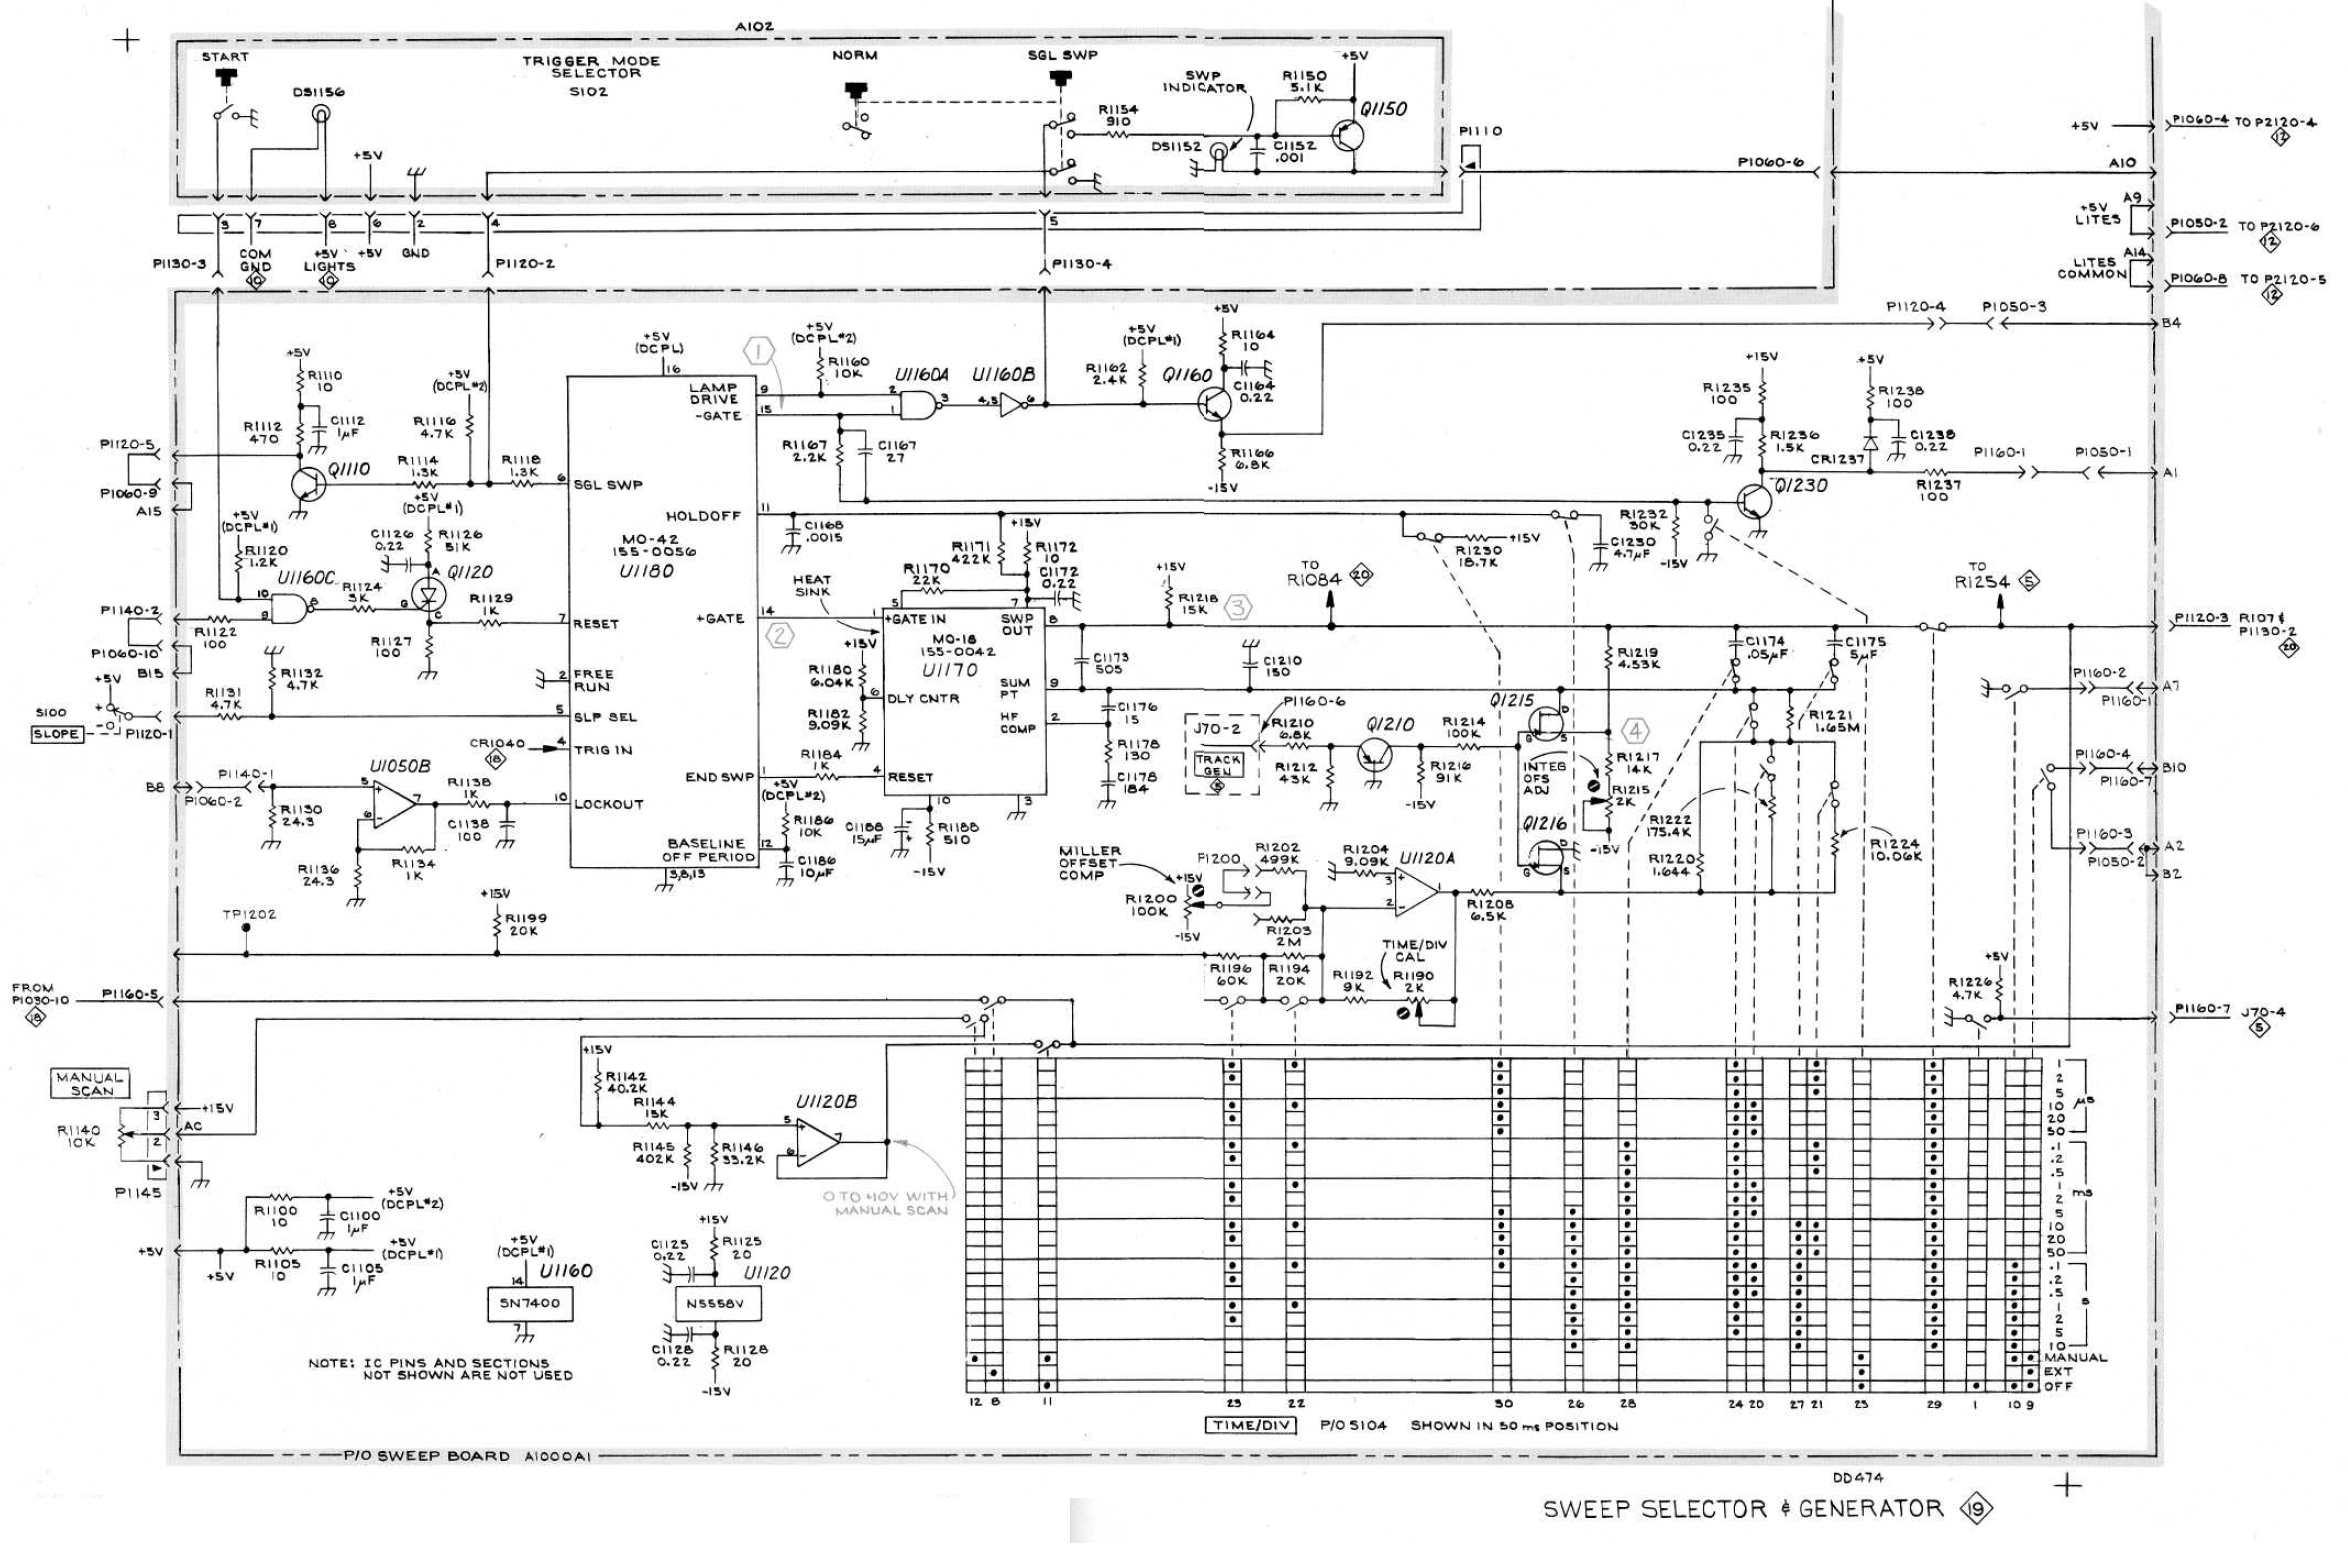 Manual für Tektronix 7L14 Spektrumanalysator